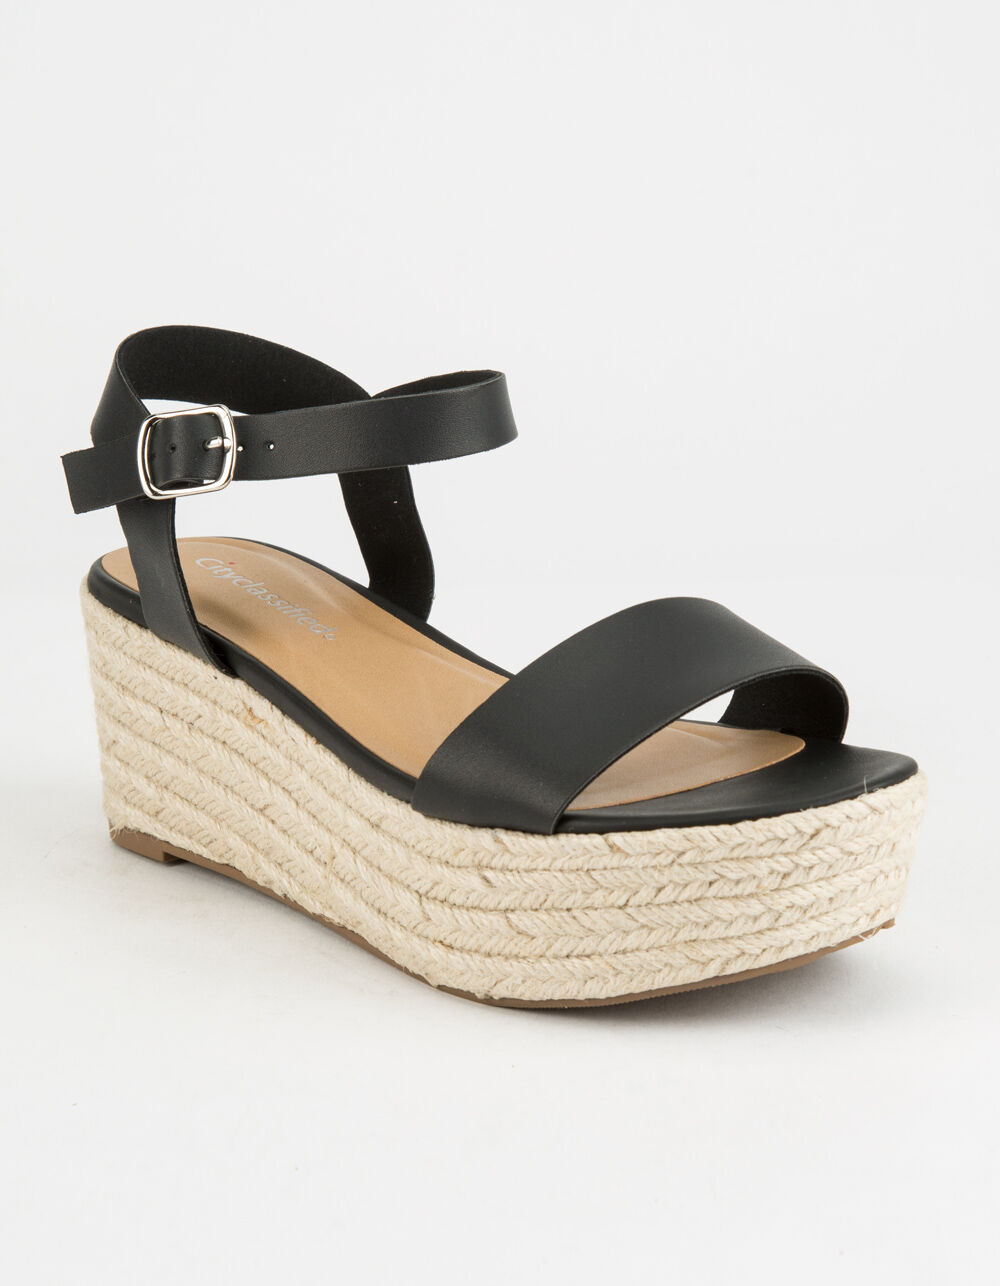 CITY CLASSIFIED Espadrille Black Platform Sandals